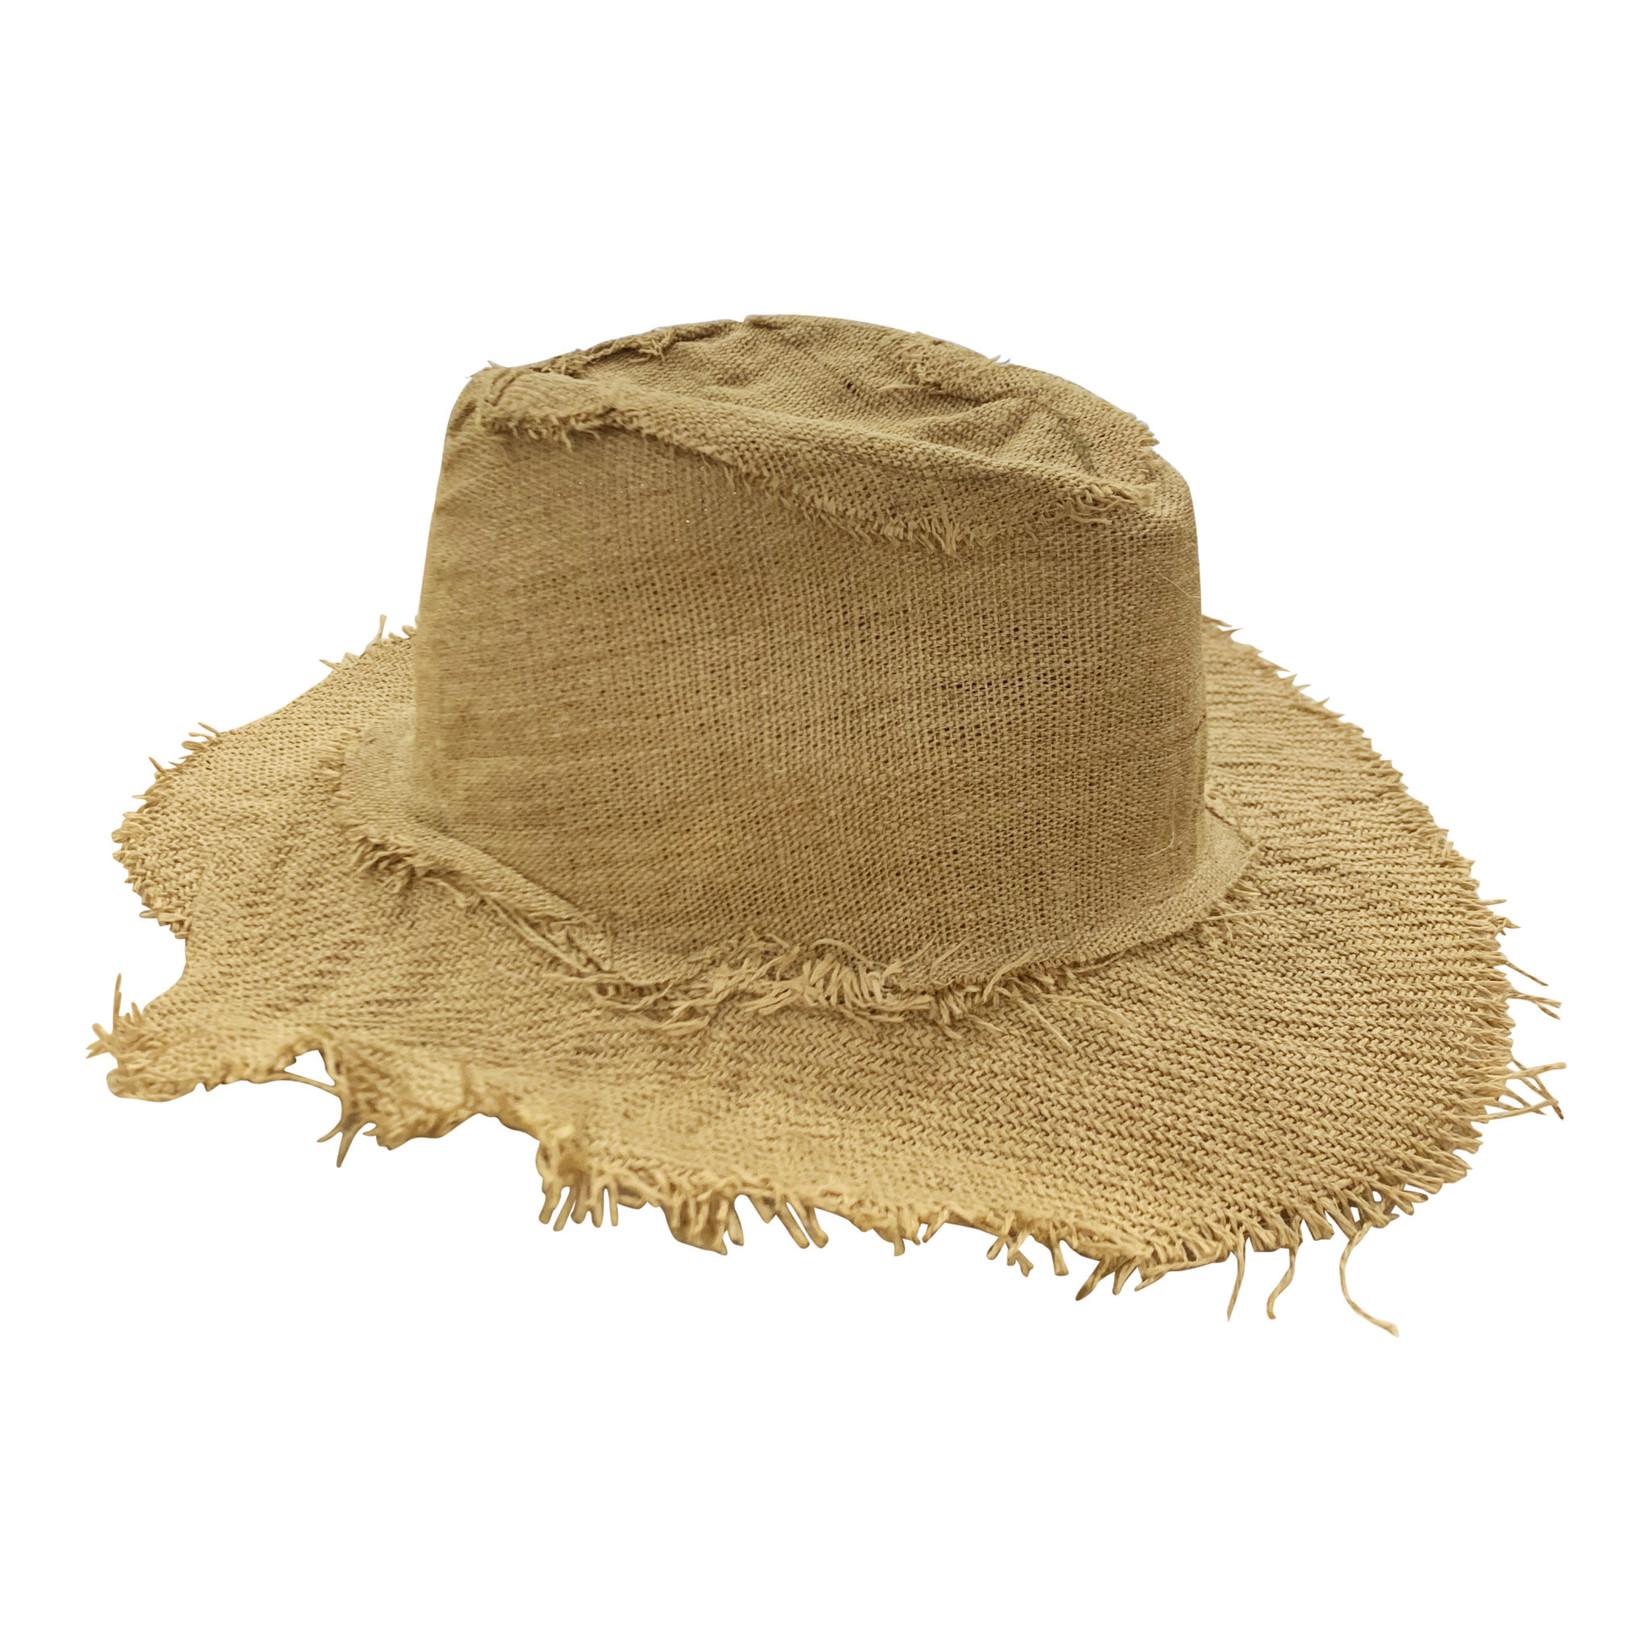 Reinhard Plank Beghe S Yute Natural Straw Hat